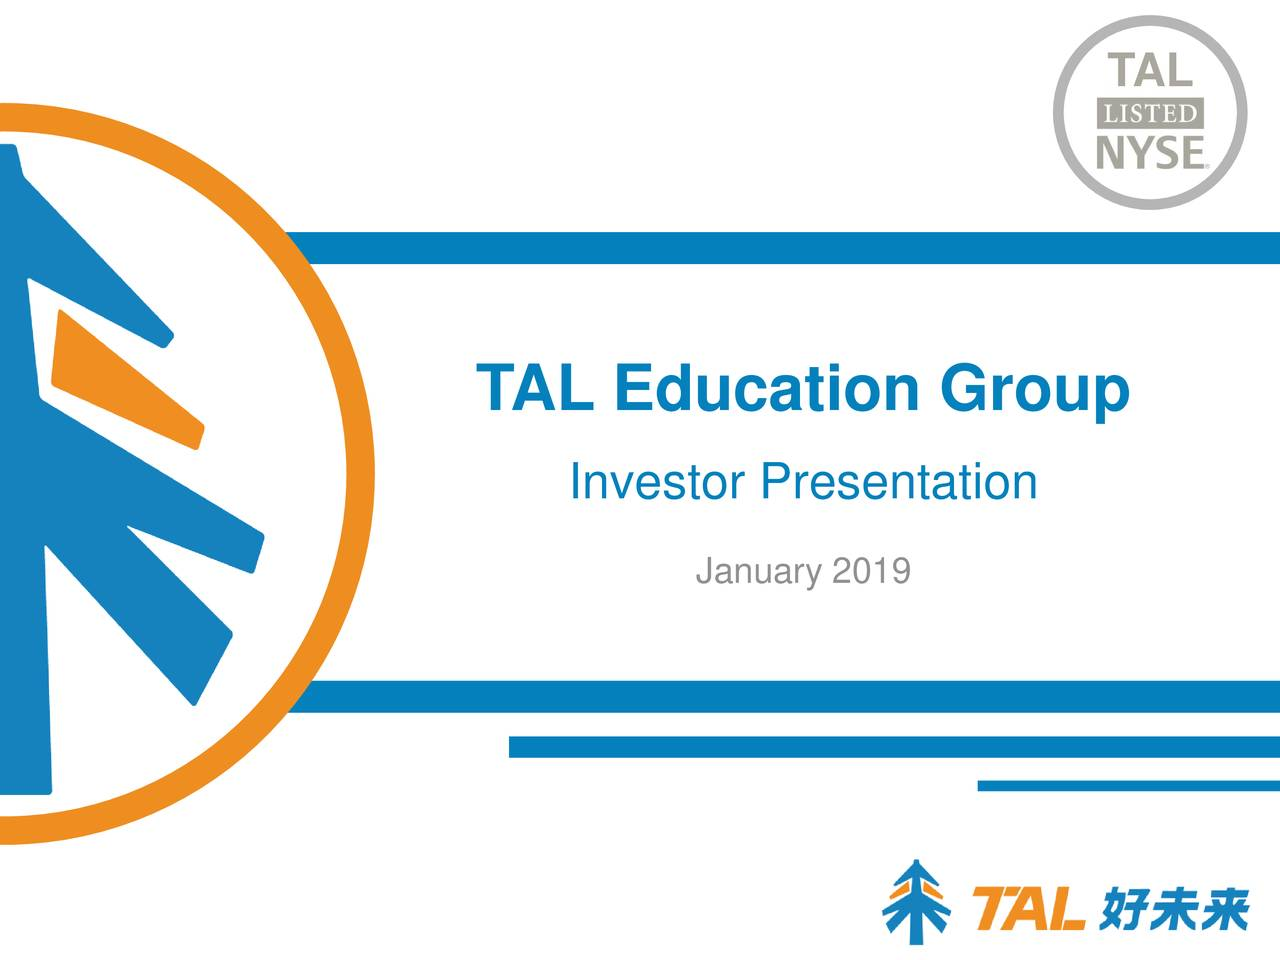 Education Group Investor Presentation January 2019